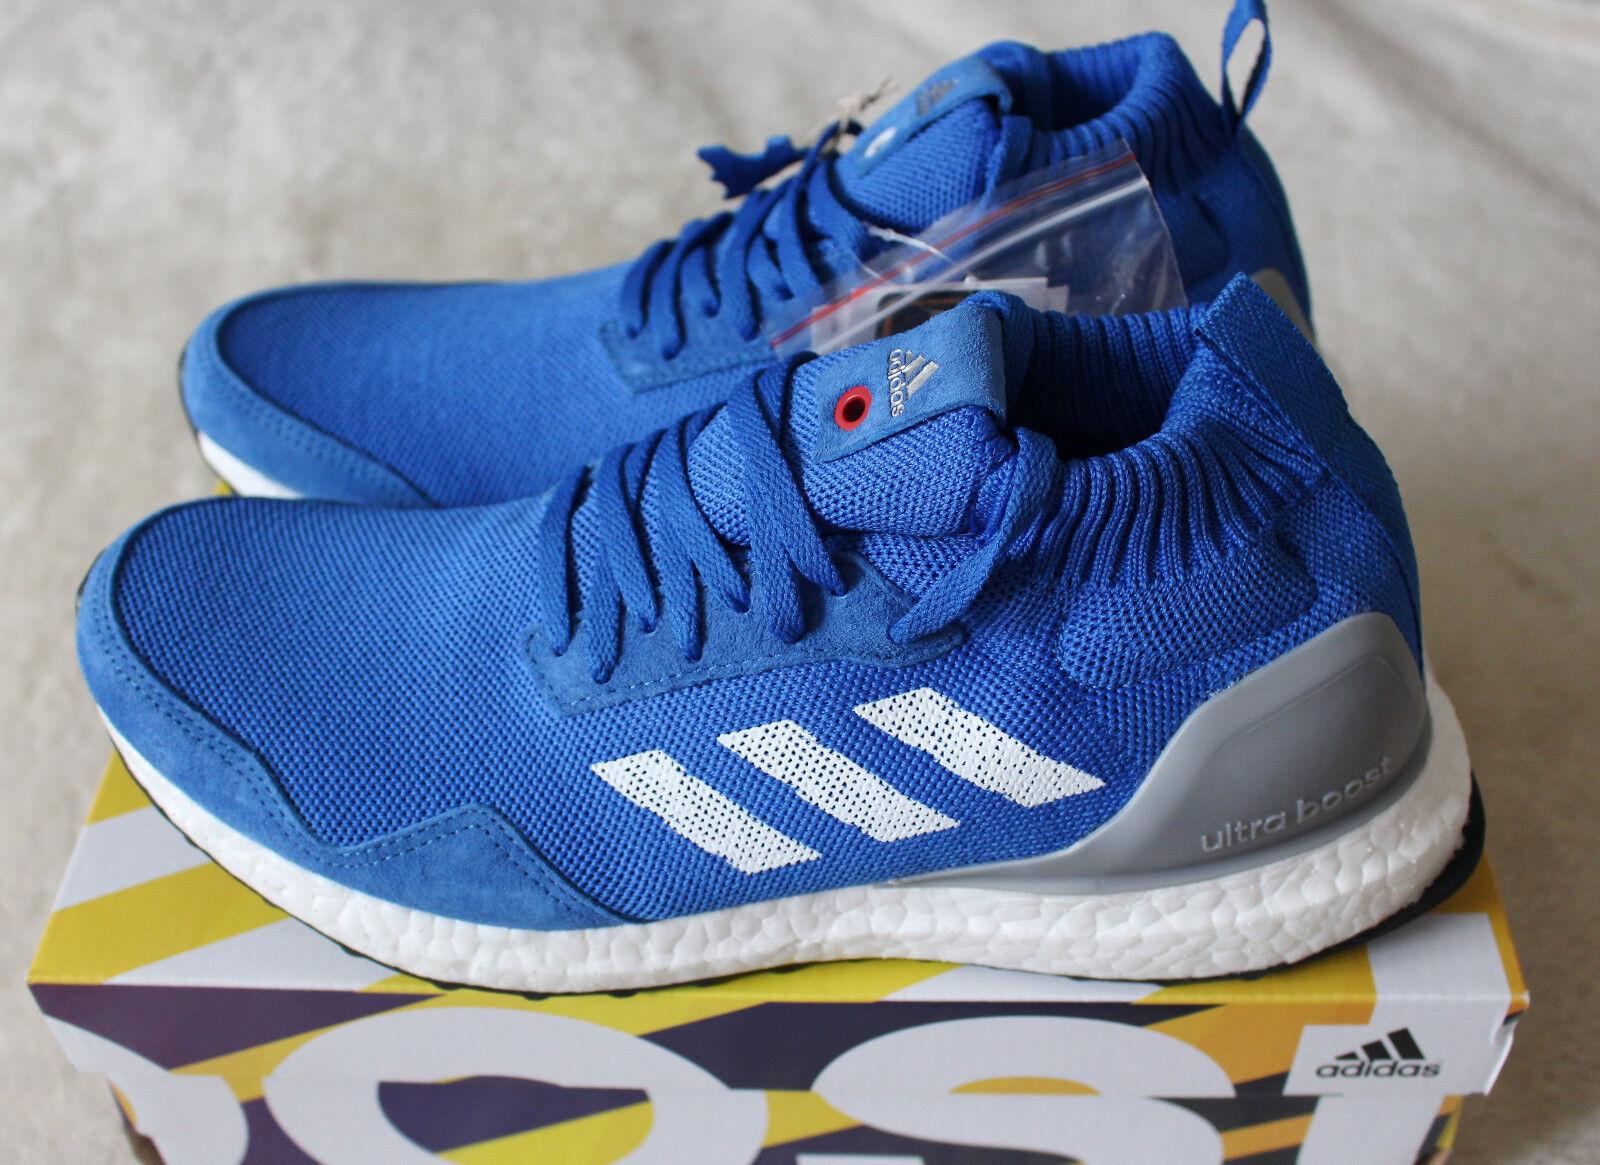 New New New Adidas Consortium Ultra Boost Mid Run Thru Time Blau grau BY3056 UK 8 US 8.5 4486a9